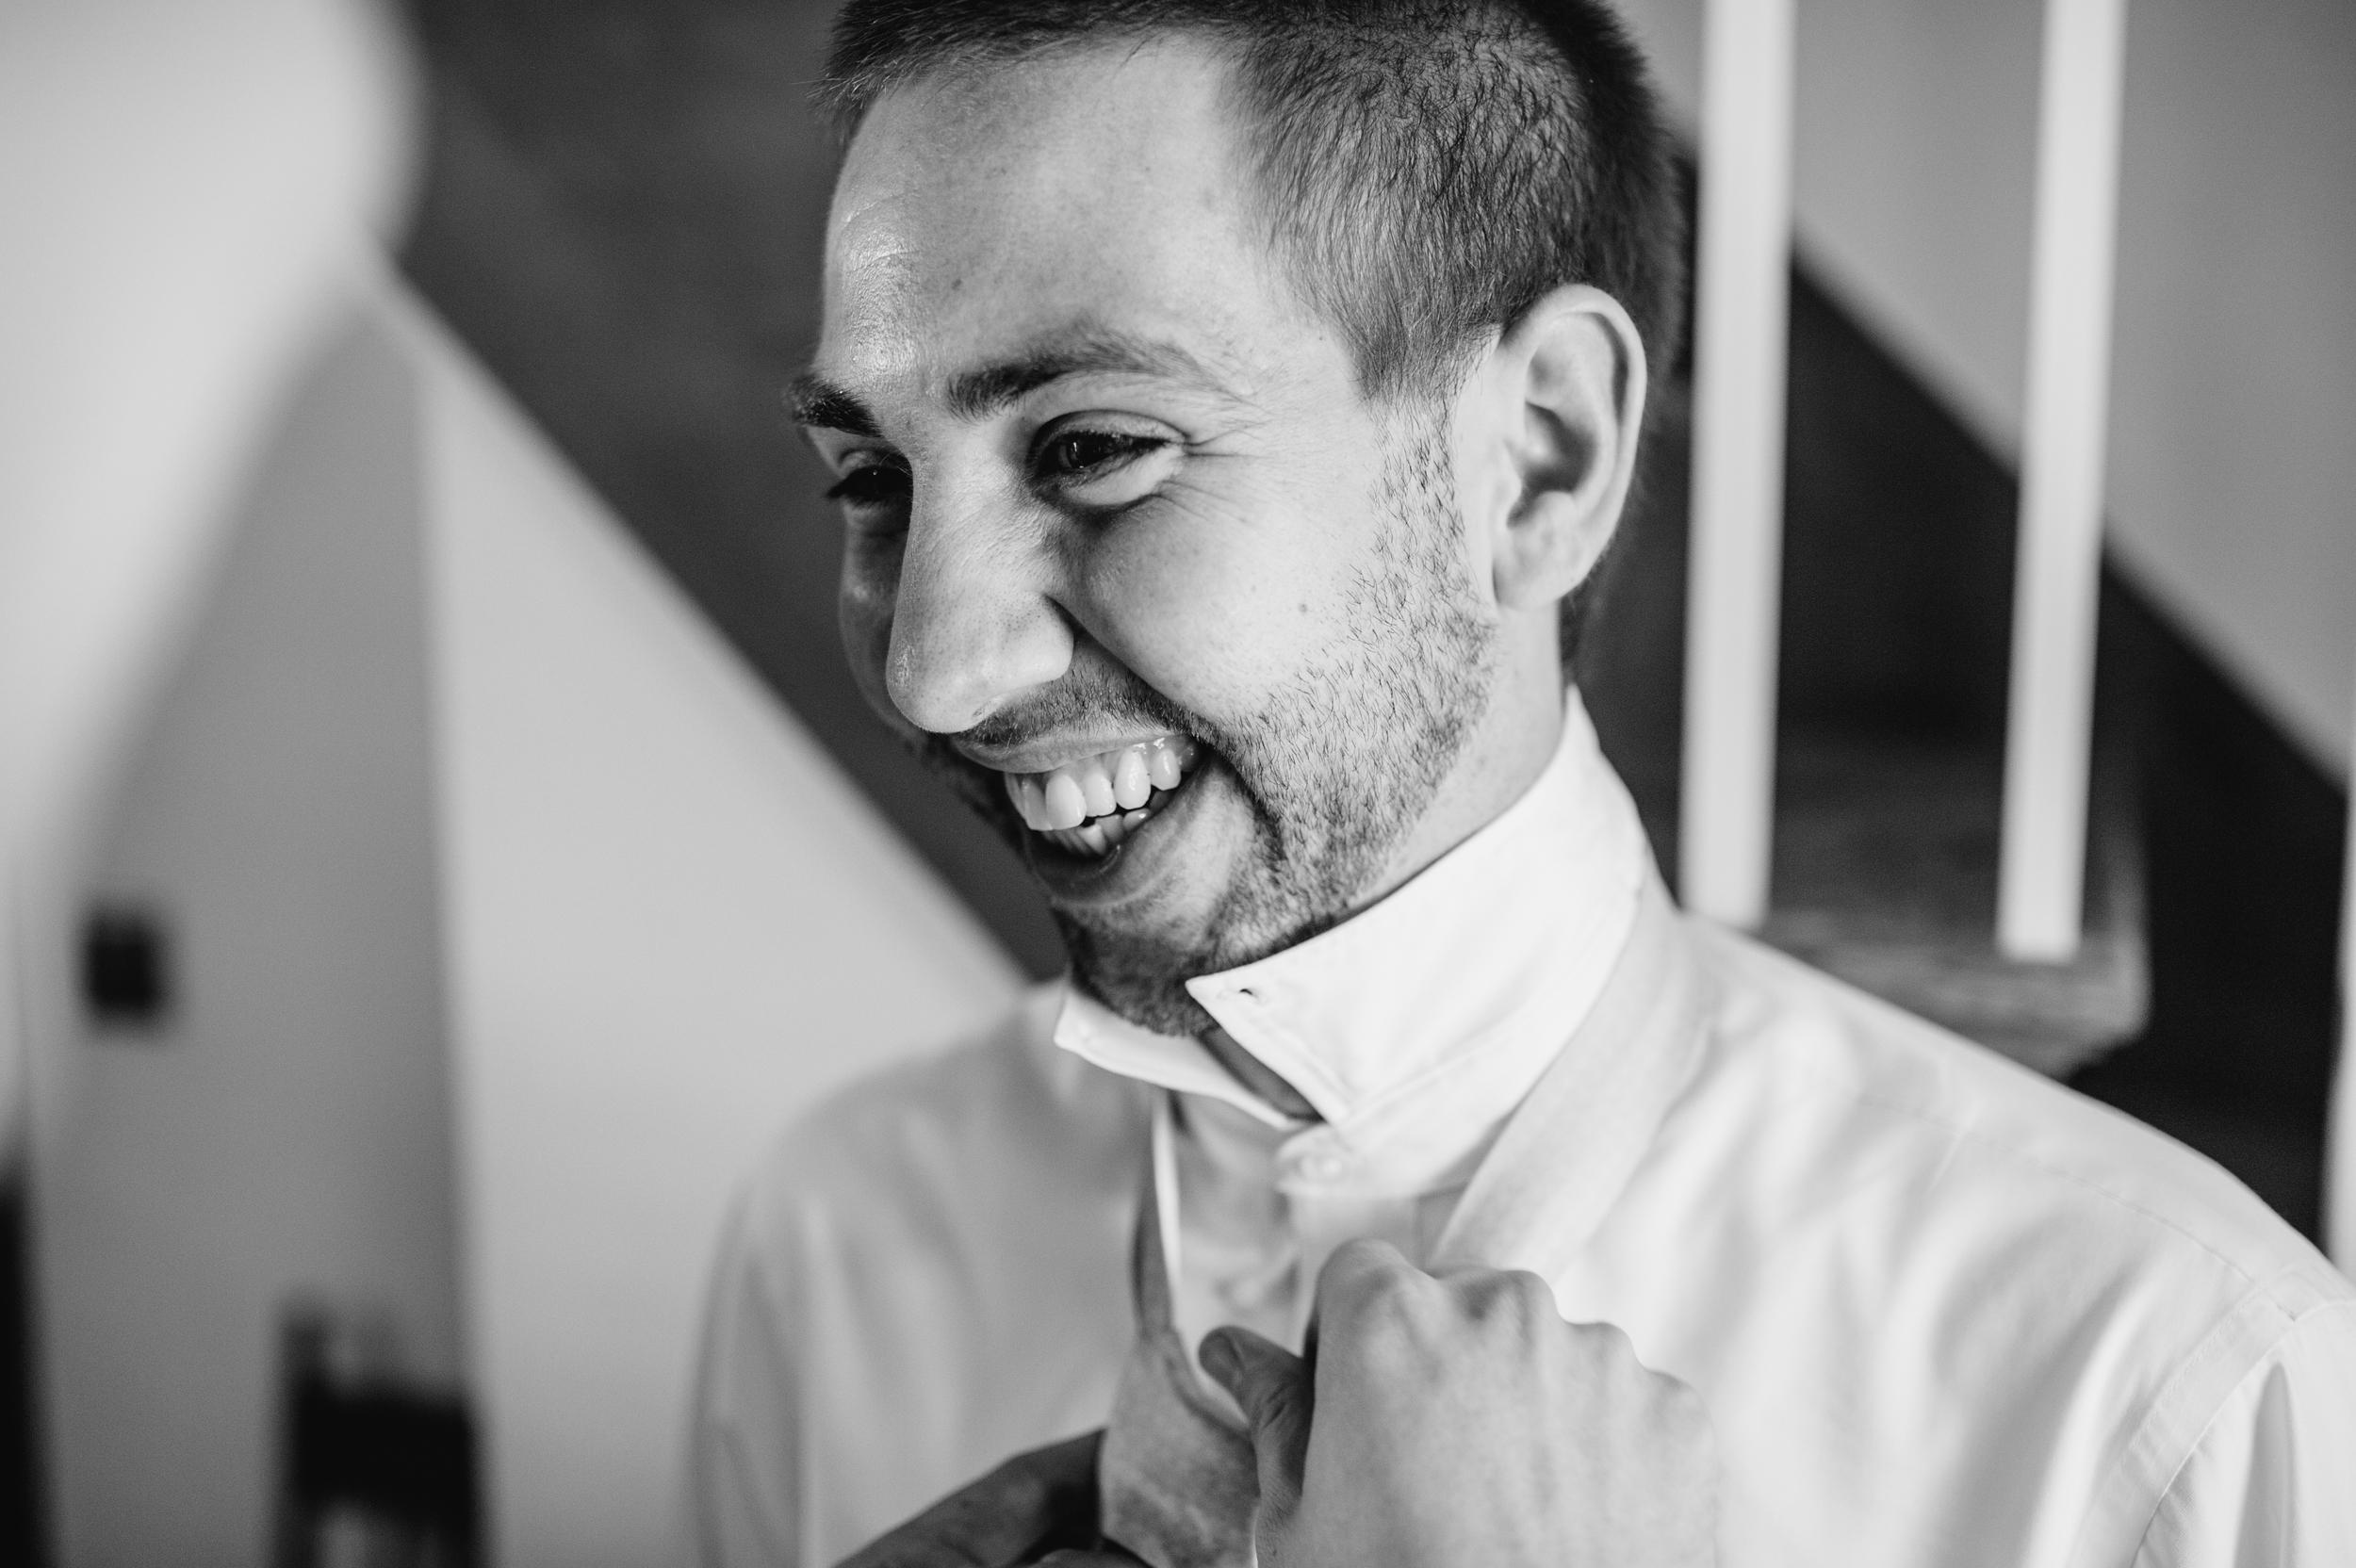 Artistic Wedding Photographer Mantas Kubilinskas-9.jpg